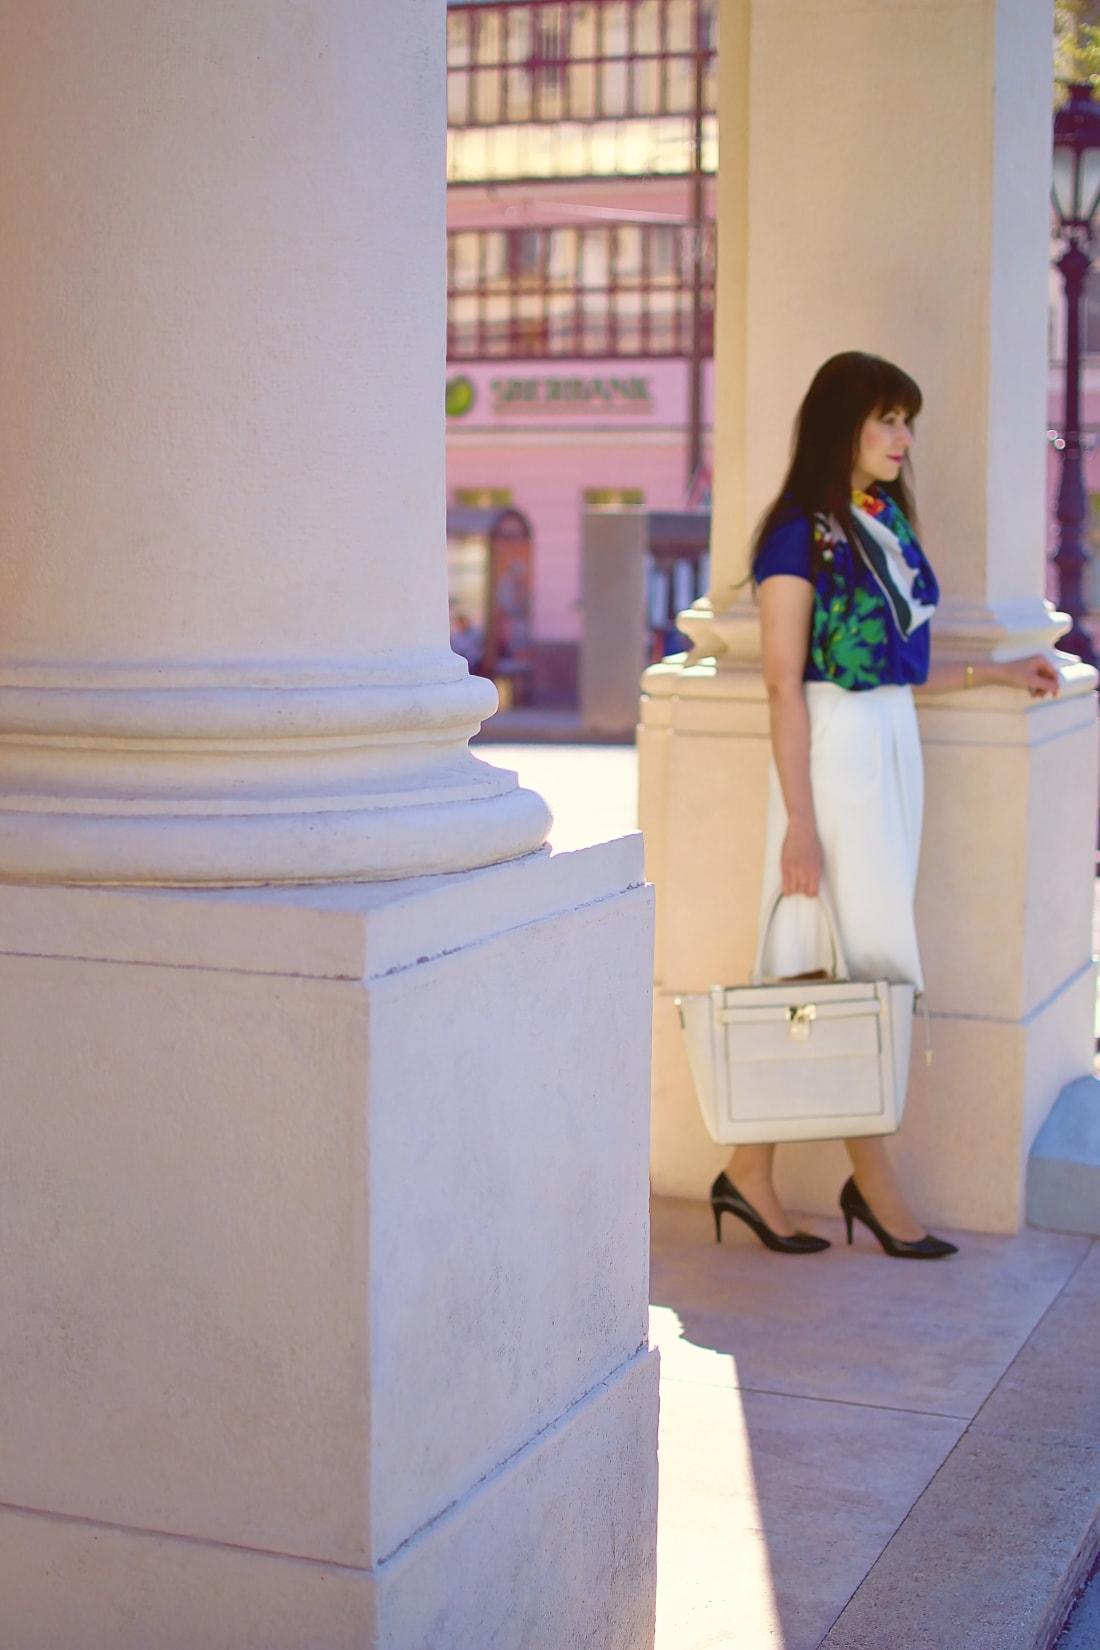 katharine-fashion-is-beautiful-blog-mix-kvetov-a-satka-2-blogger